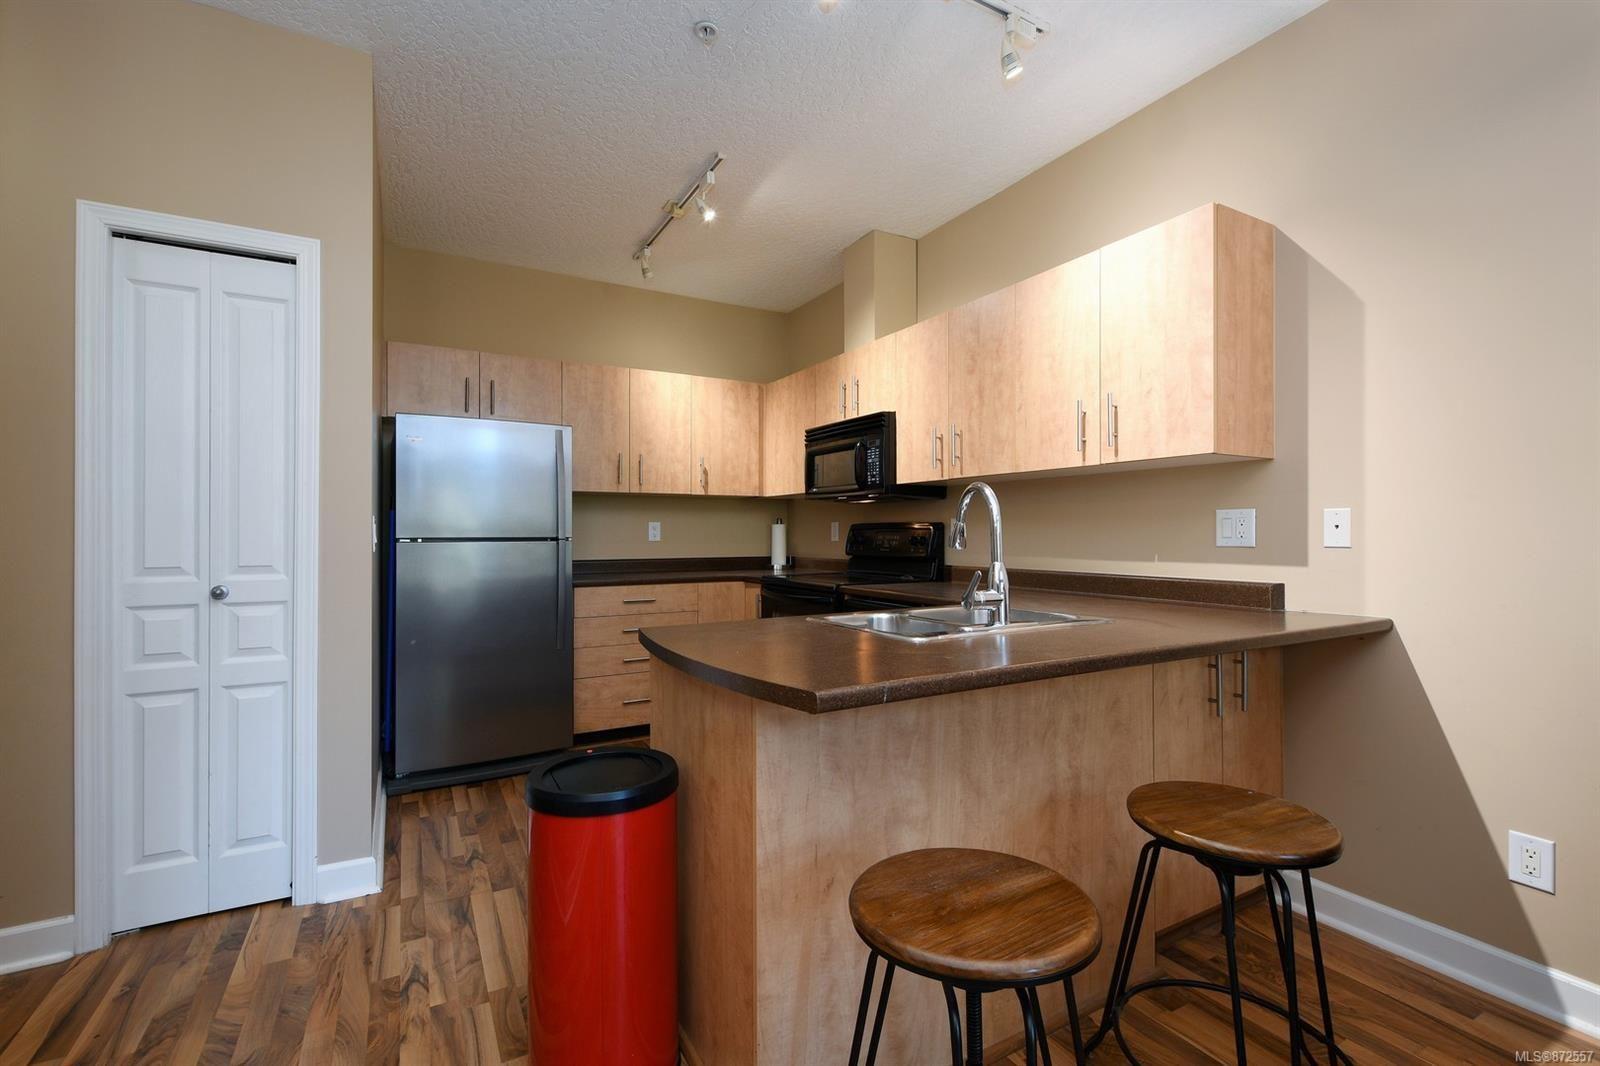 Photo 7: Photos: 411 825 Goldstream Ave in : La Langford Proper Condo for sale (Langford)  : MLS®# 872557